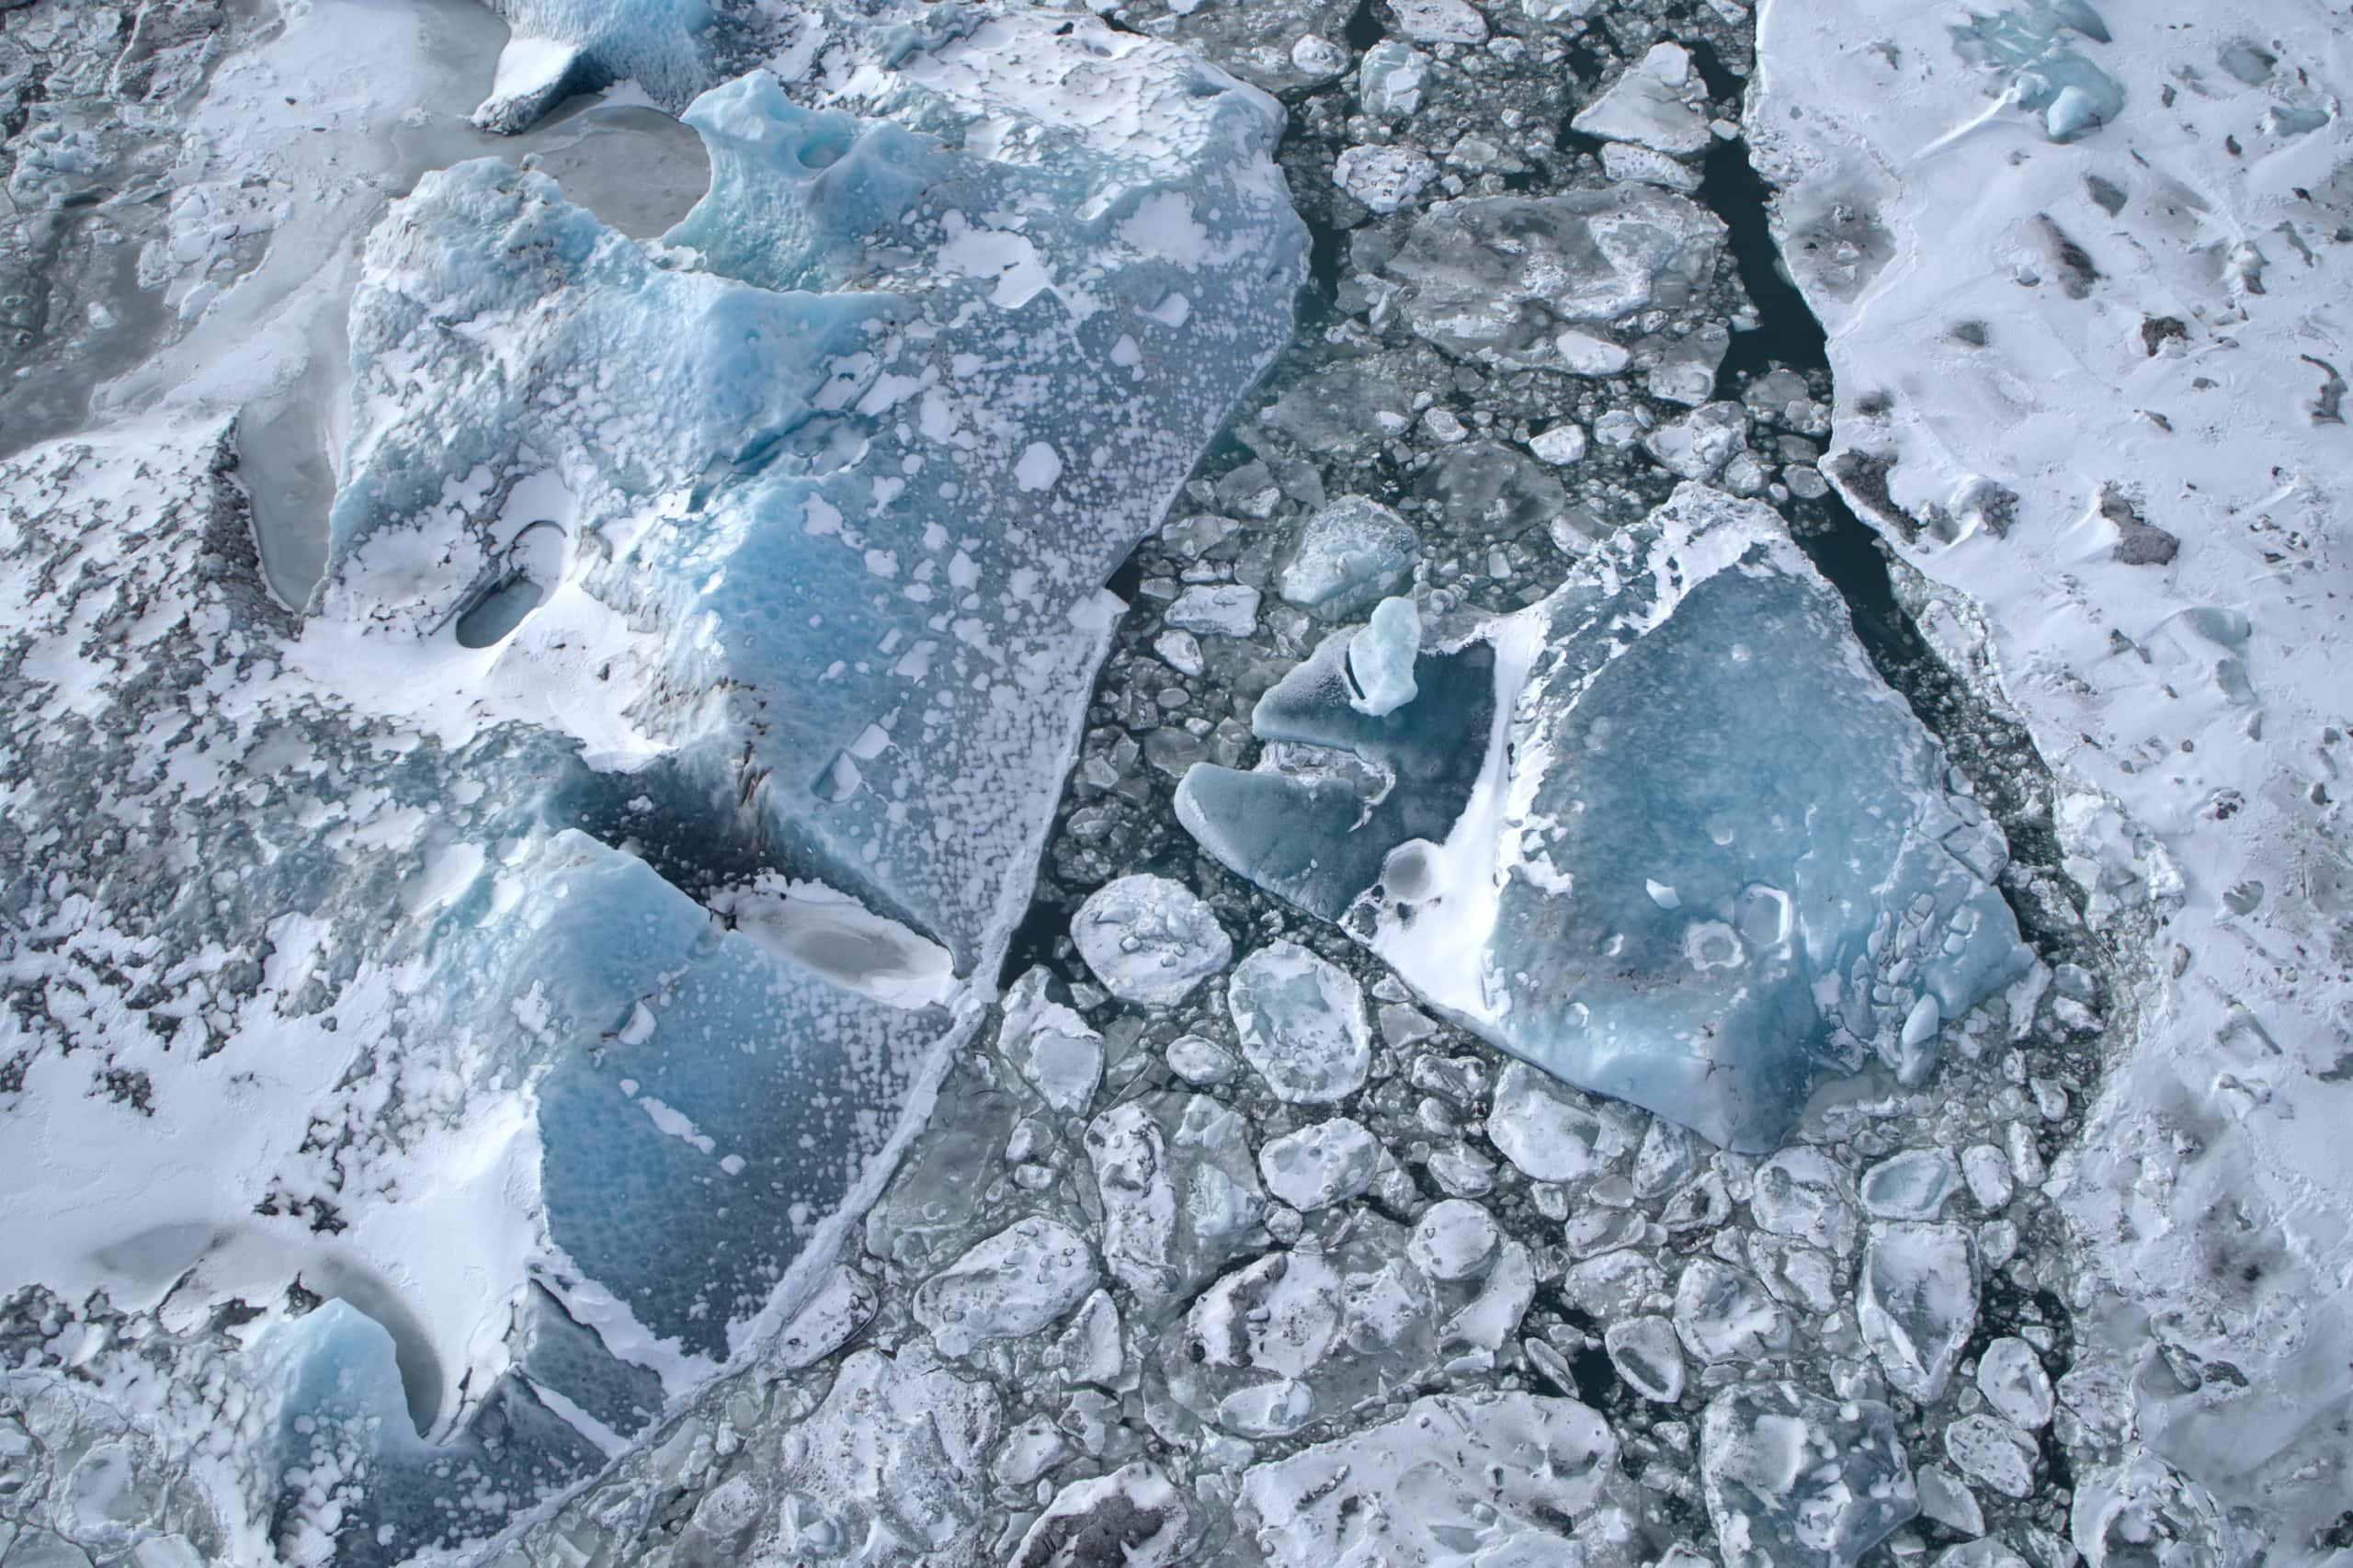 earth mood frozen calm